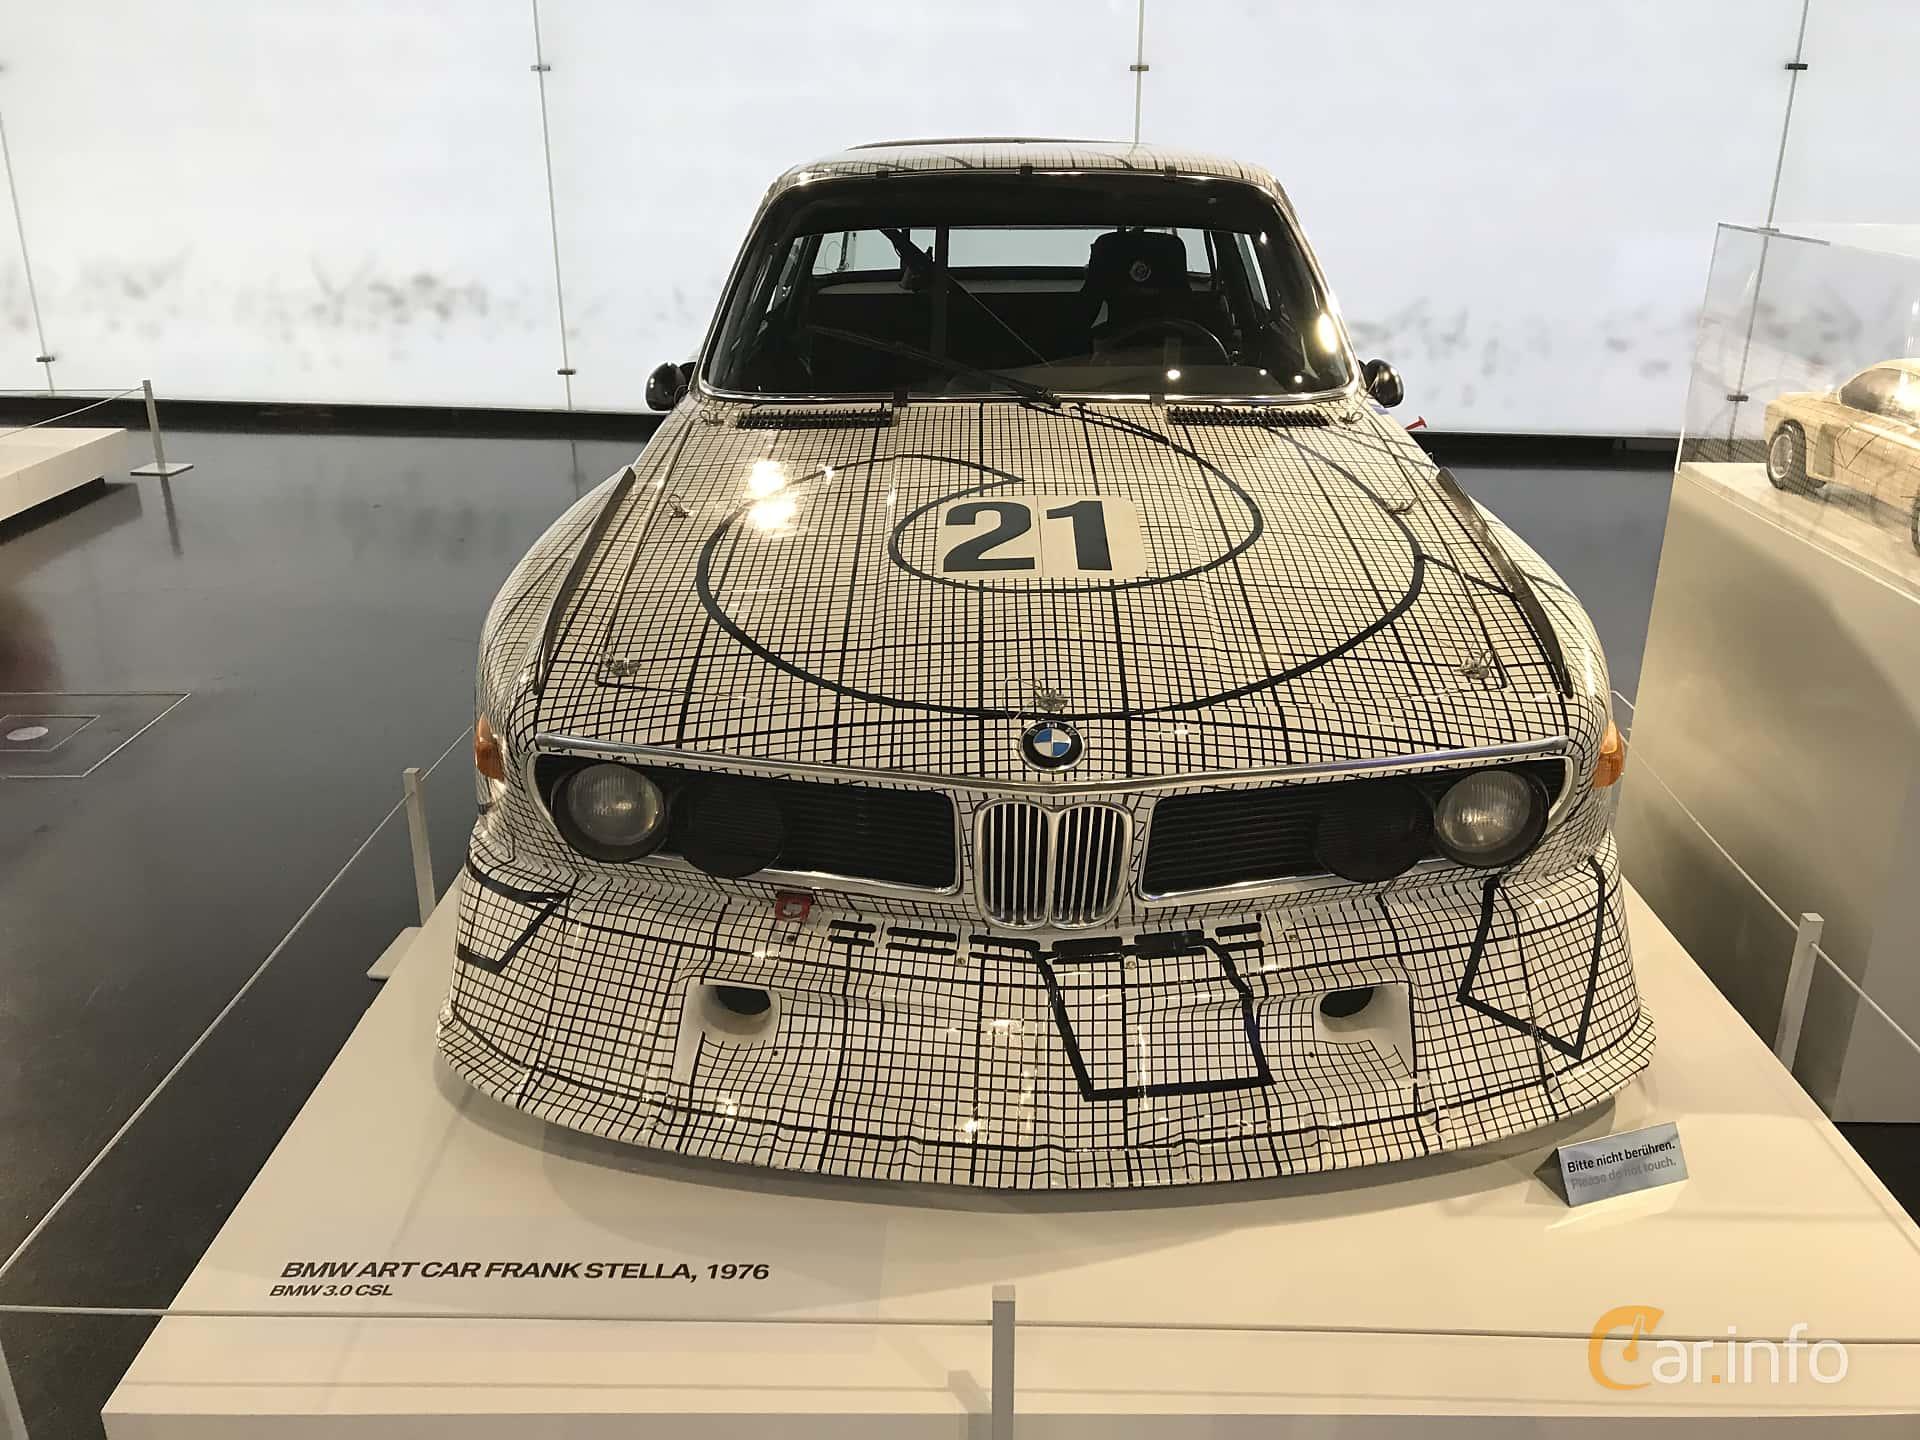 BMW 3.0 CSL Group 5  Manual, 487hp, 1976